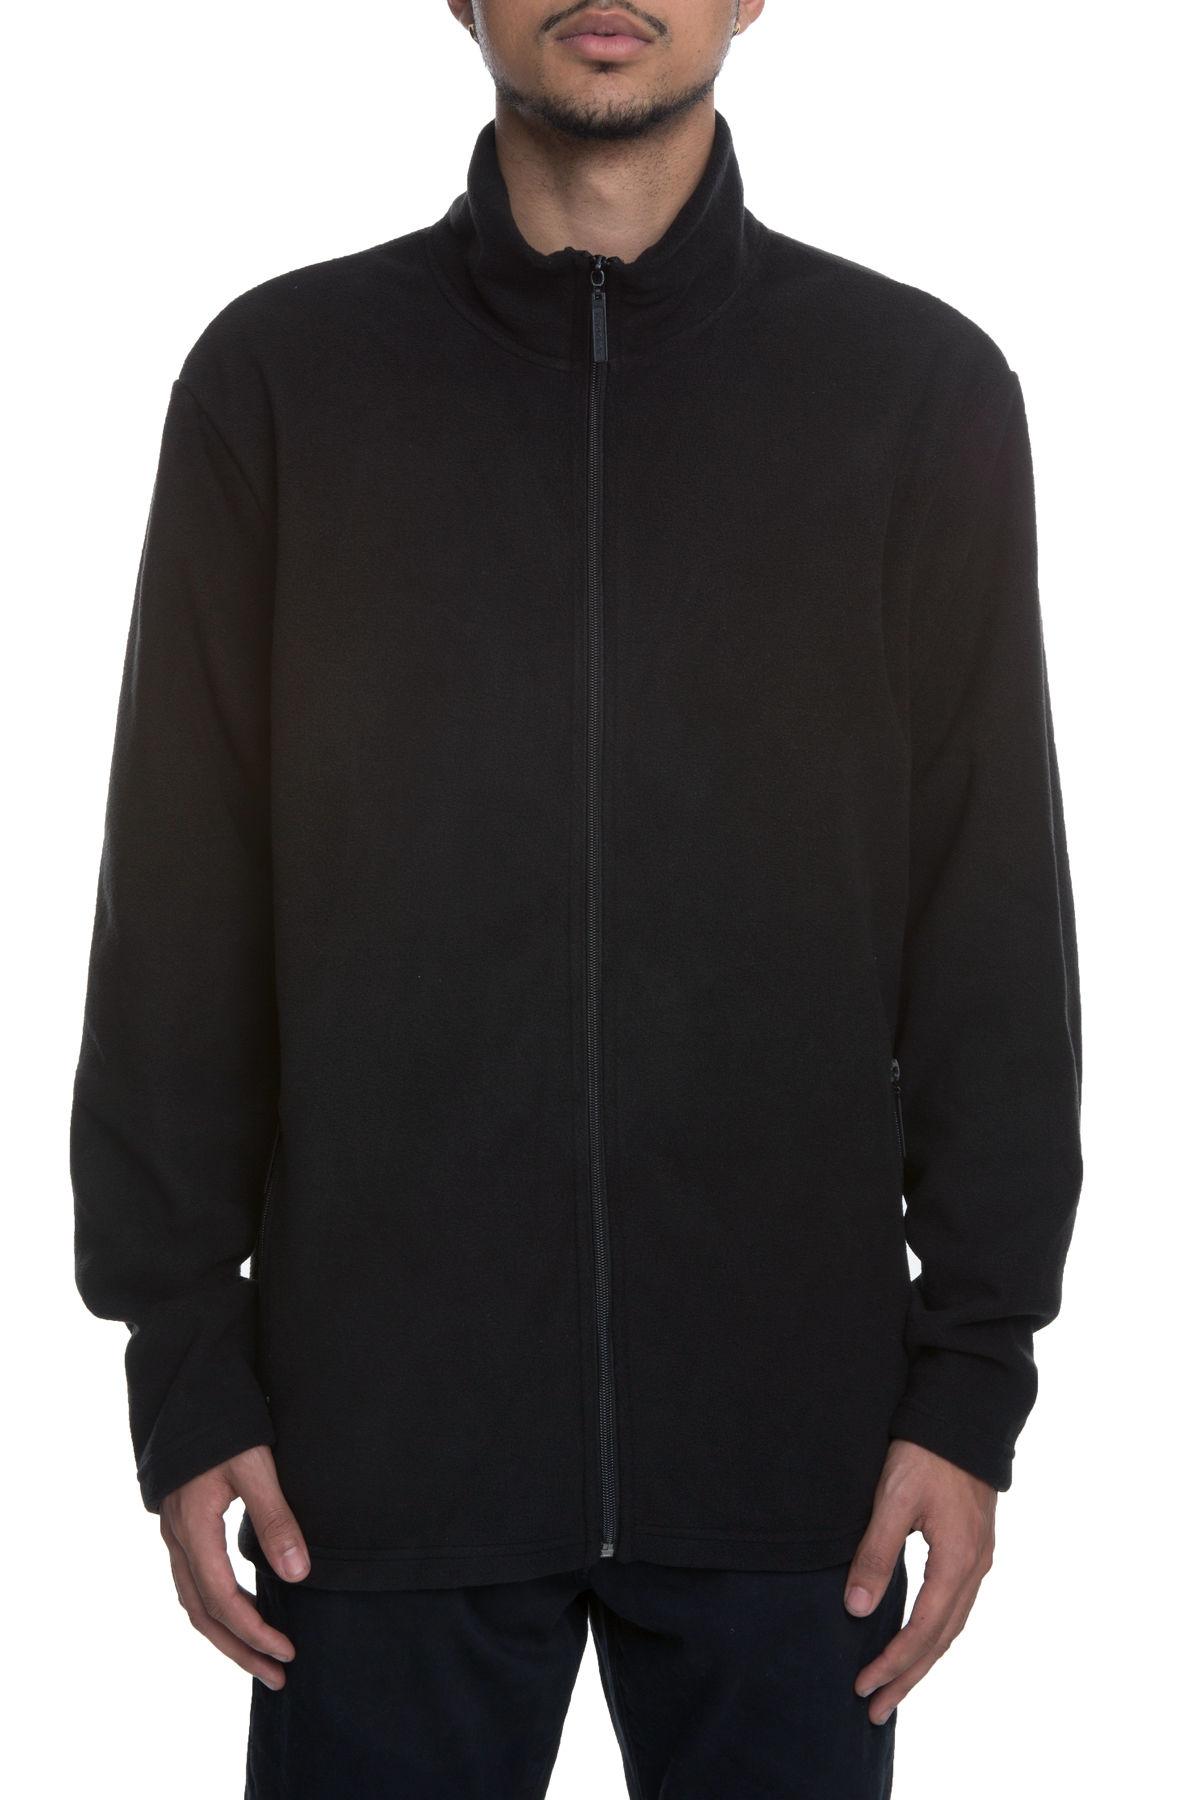 Image of Something Fleece in Black